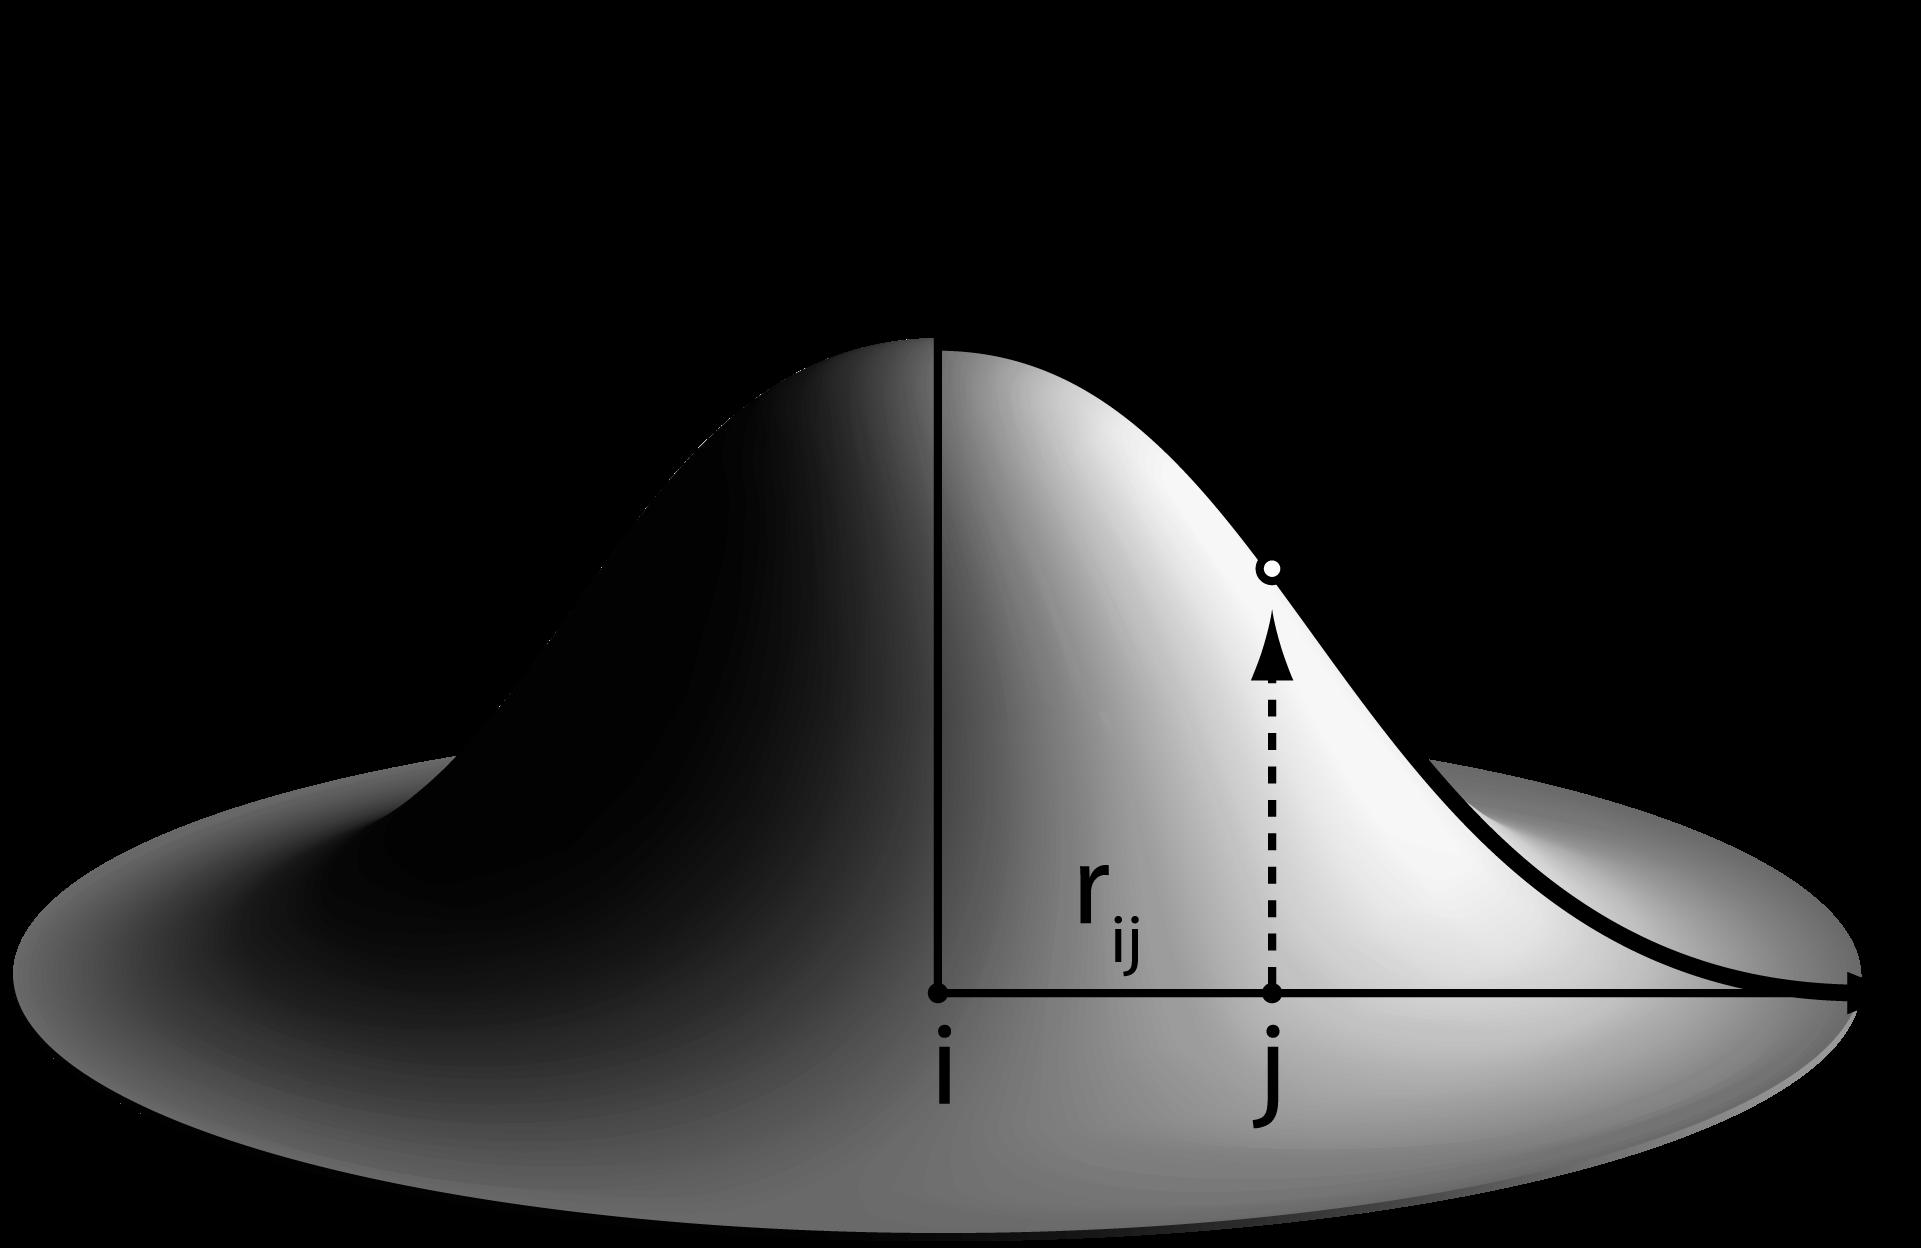 SPH kernel function